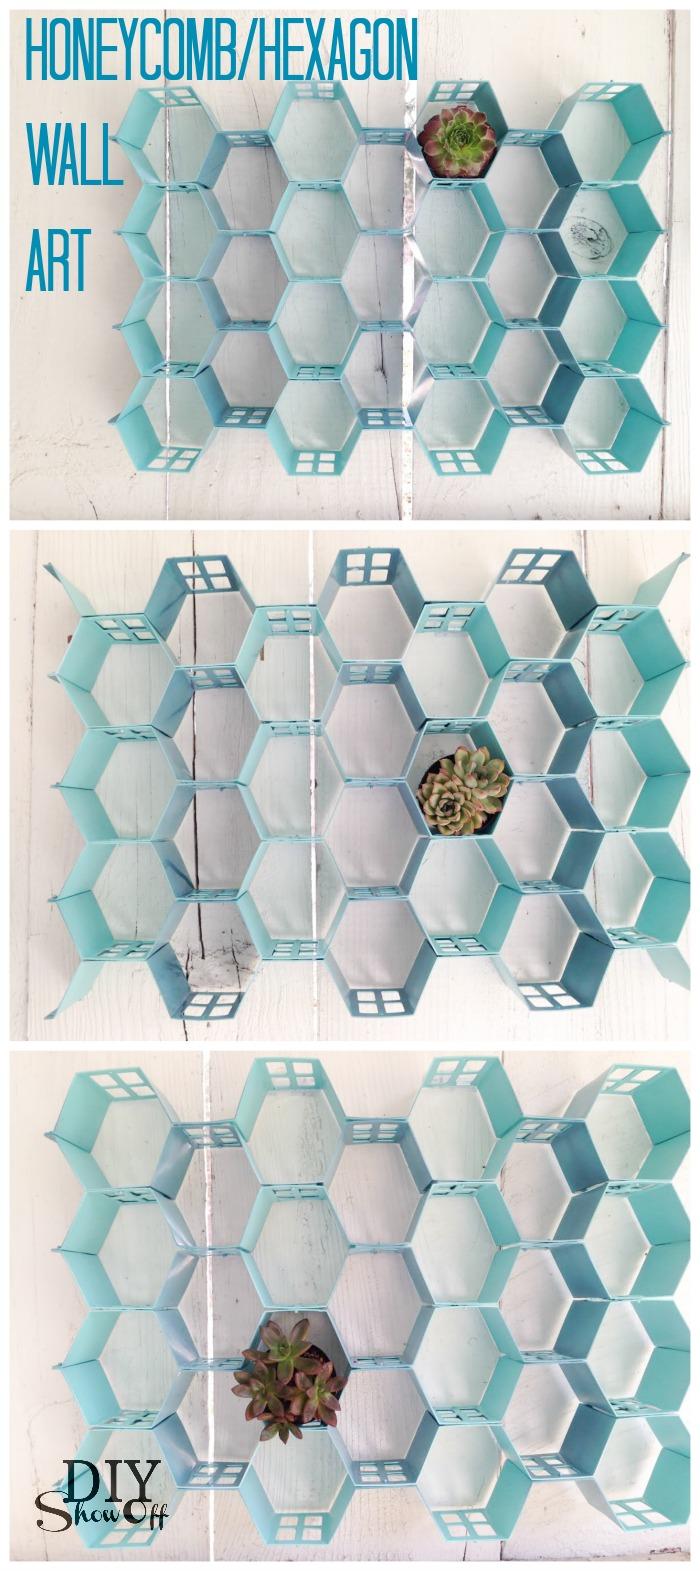 DIY honeycomb hexagon wall art at diyshowoff.com